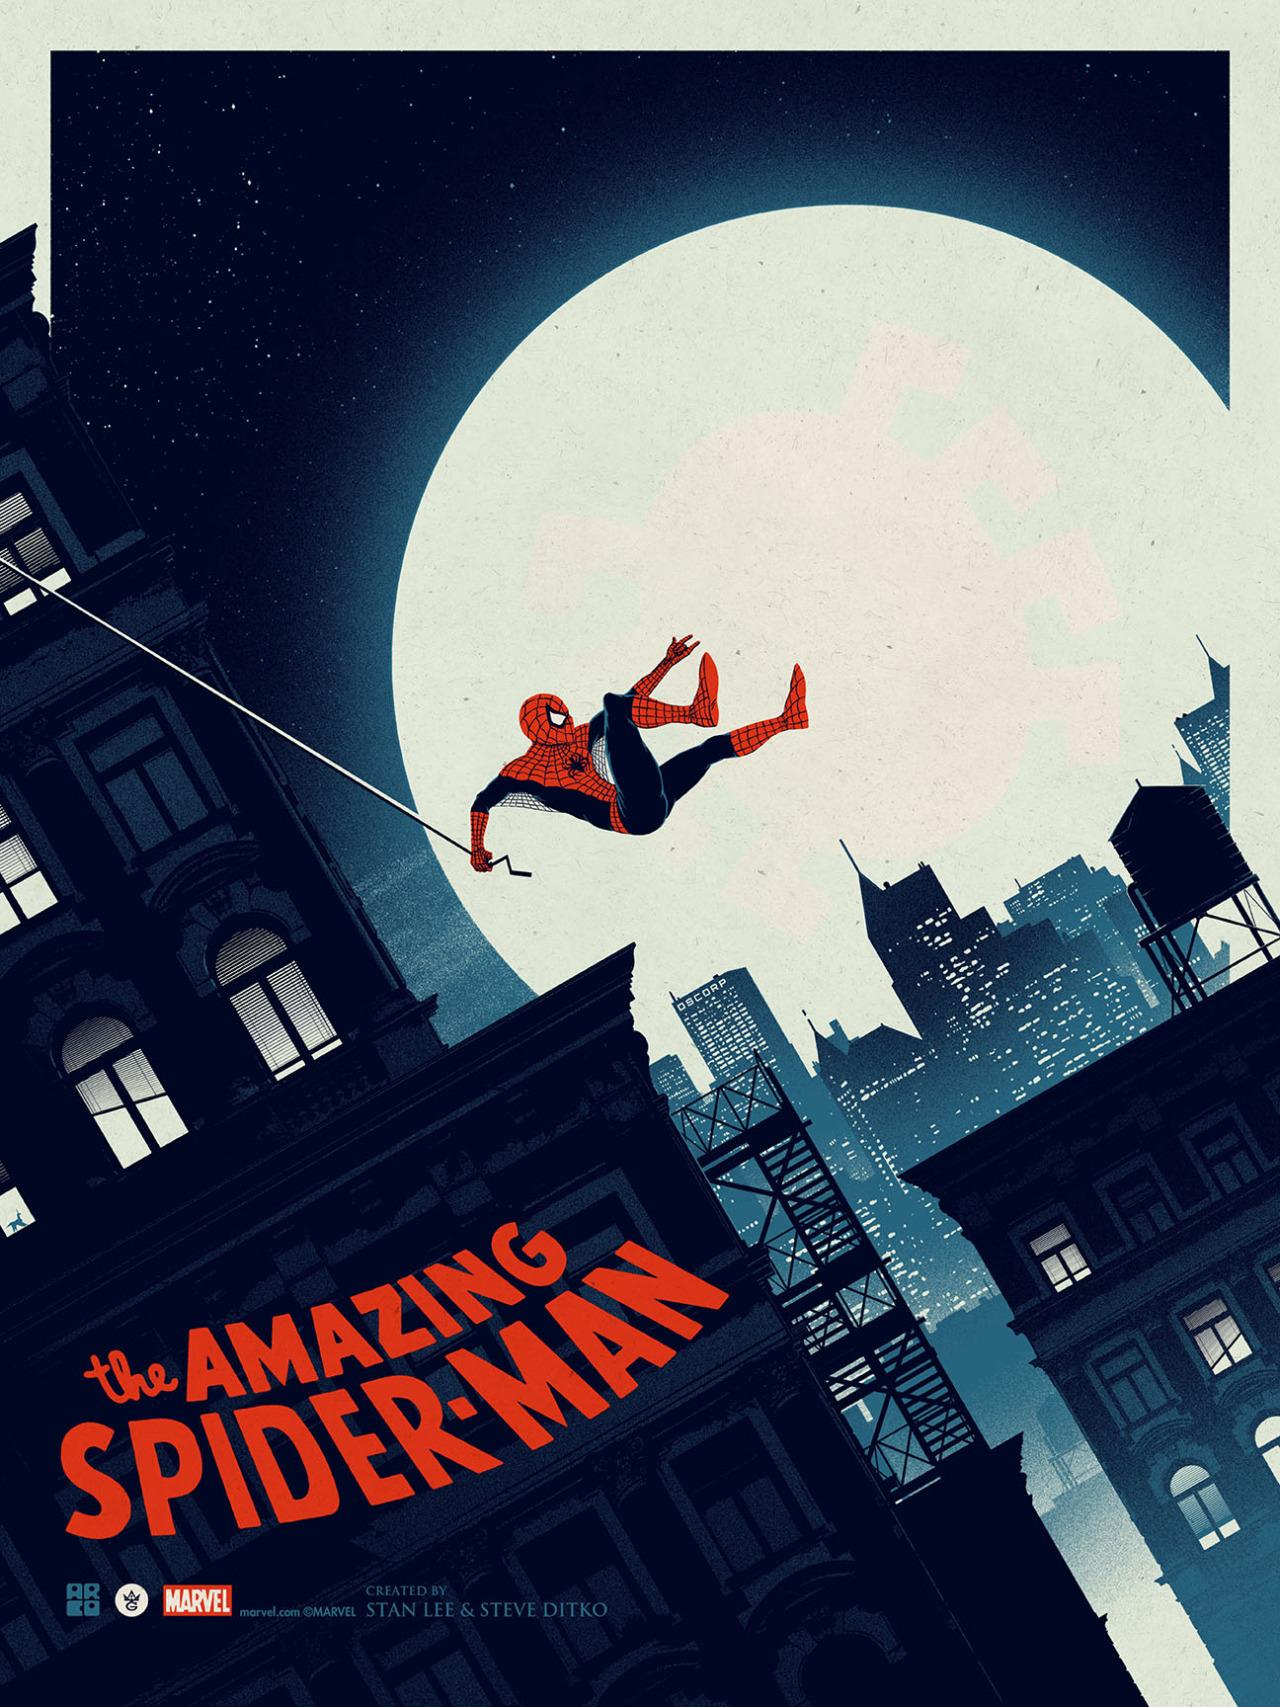 the-amazing-spider-man-art-by-matt-ferguson1